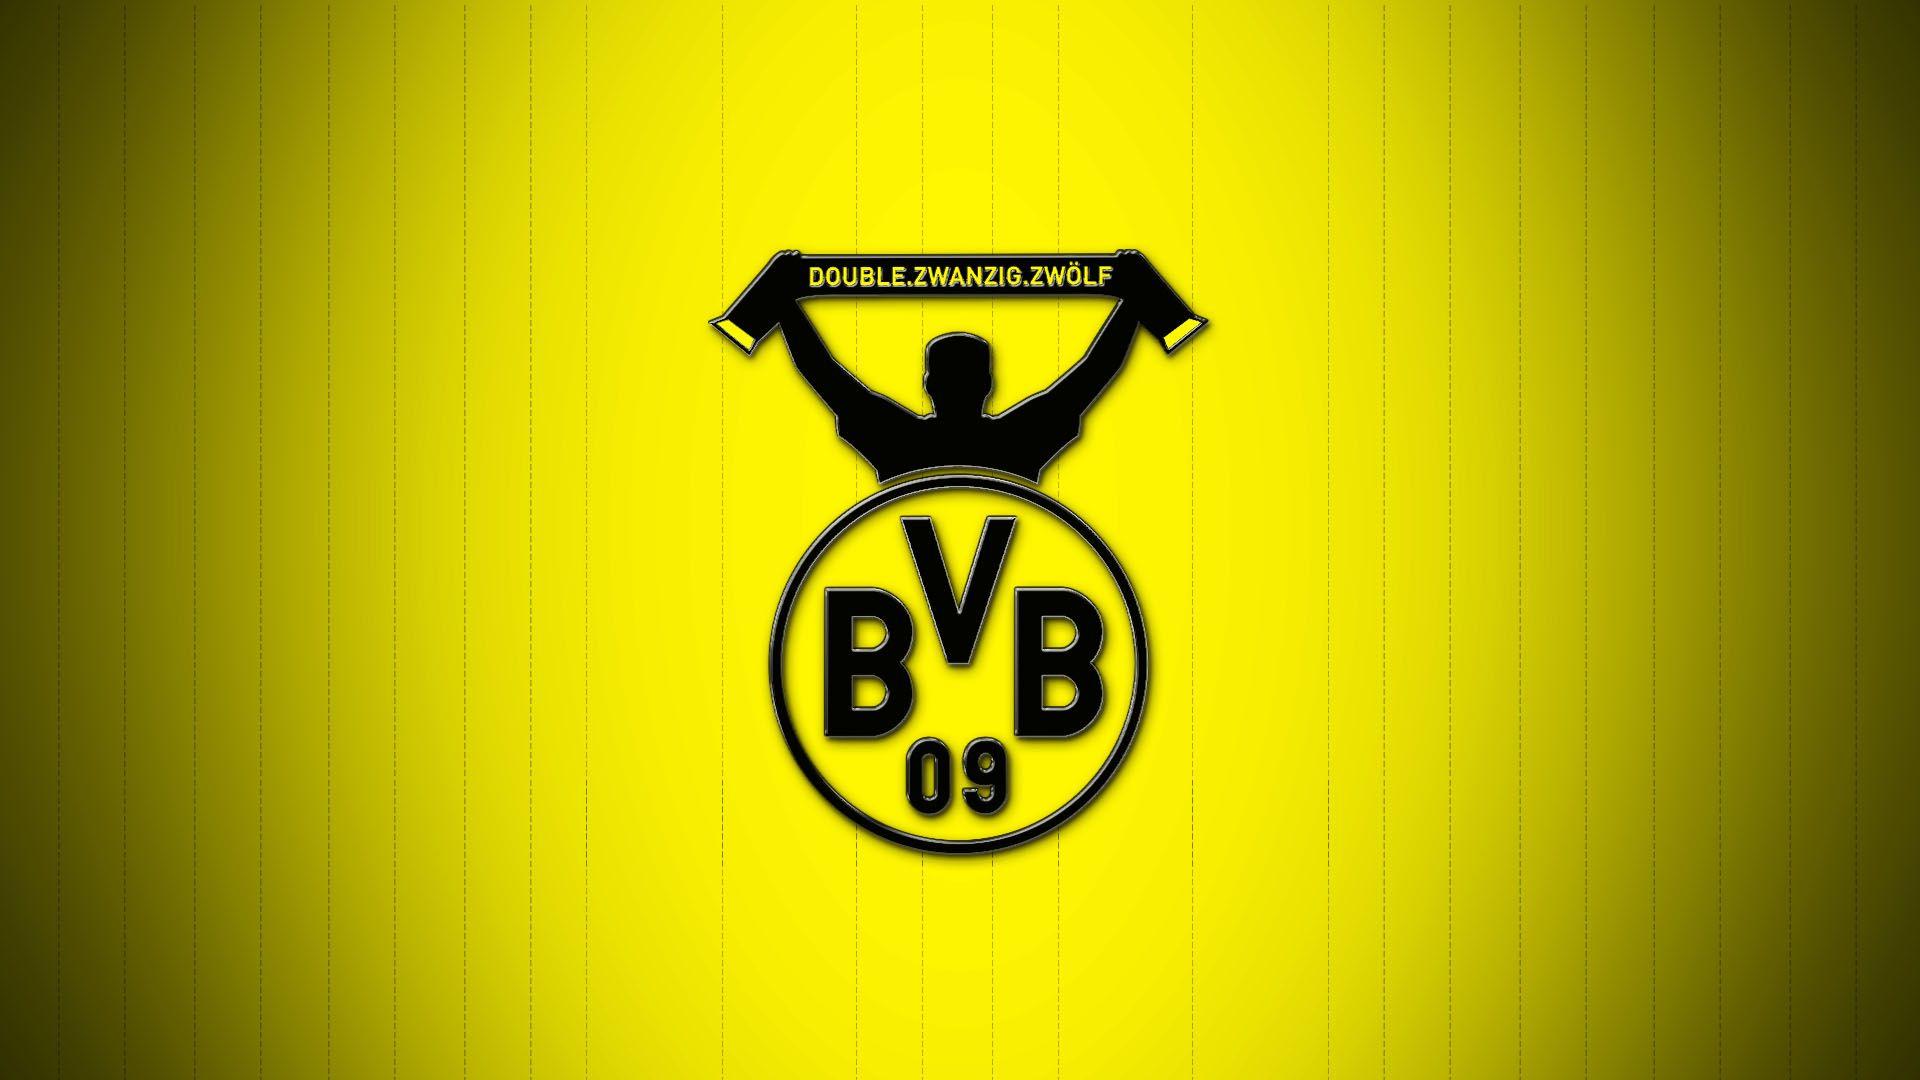 Borussia Dortmund 2013 Borussiadortmund Hd Wallpaper Borussia Dortmund Dortmund Borussia Dortmund Wallpaper